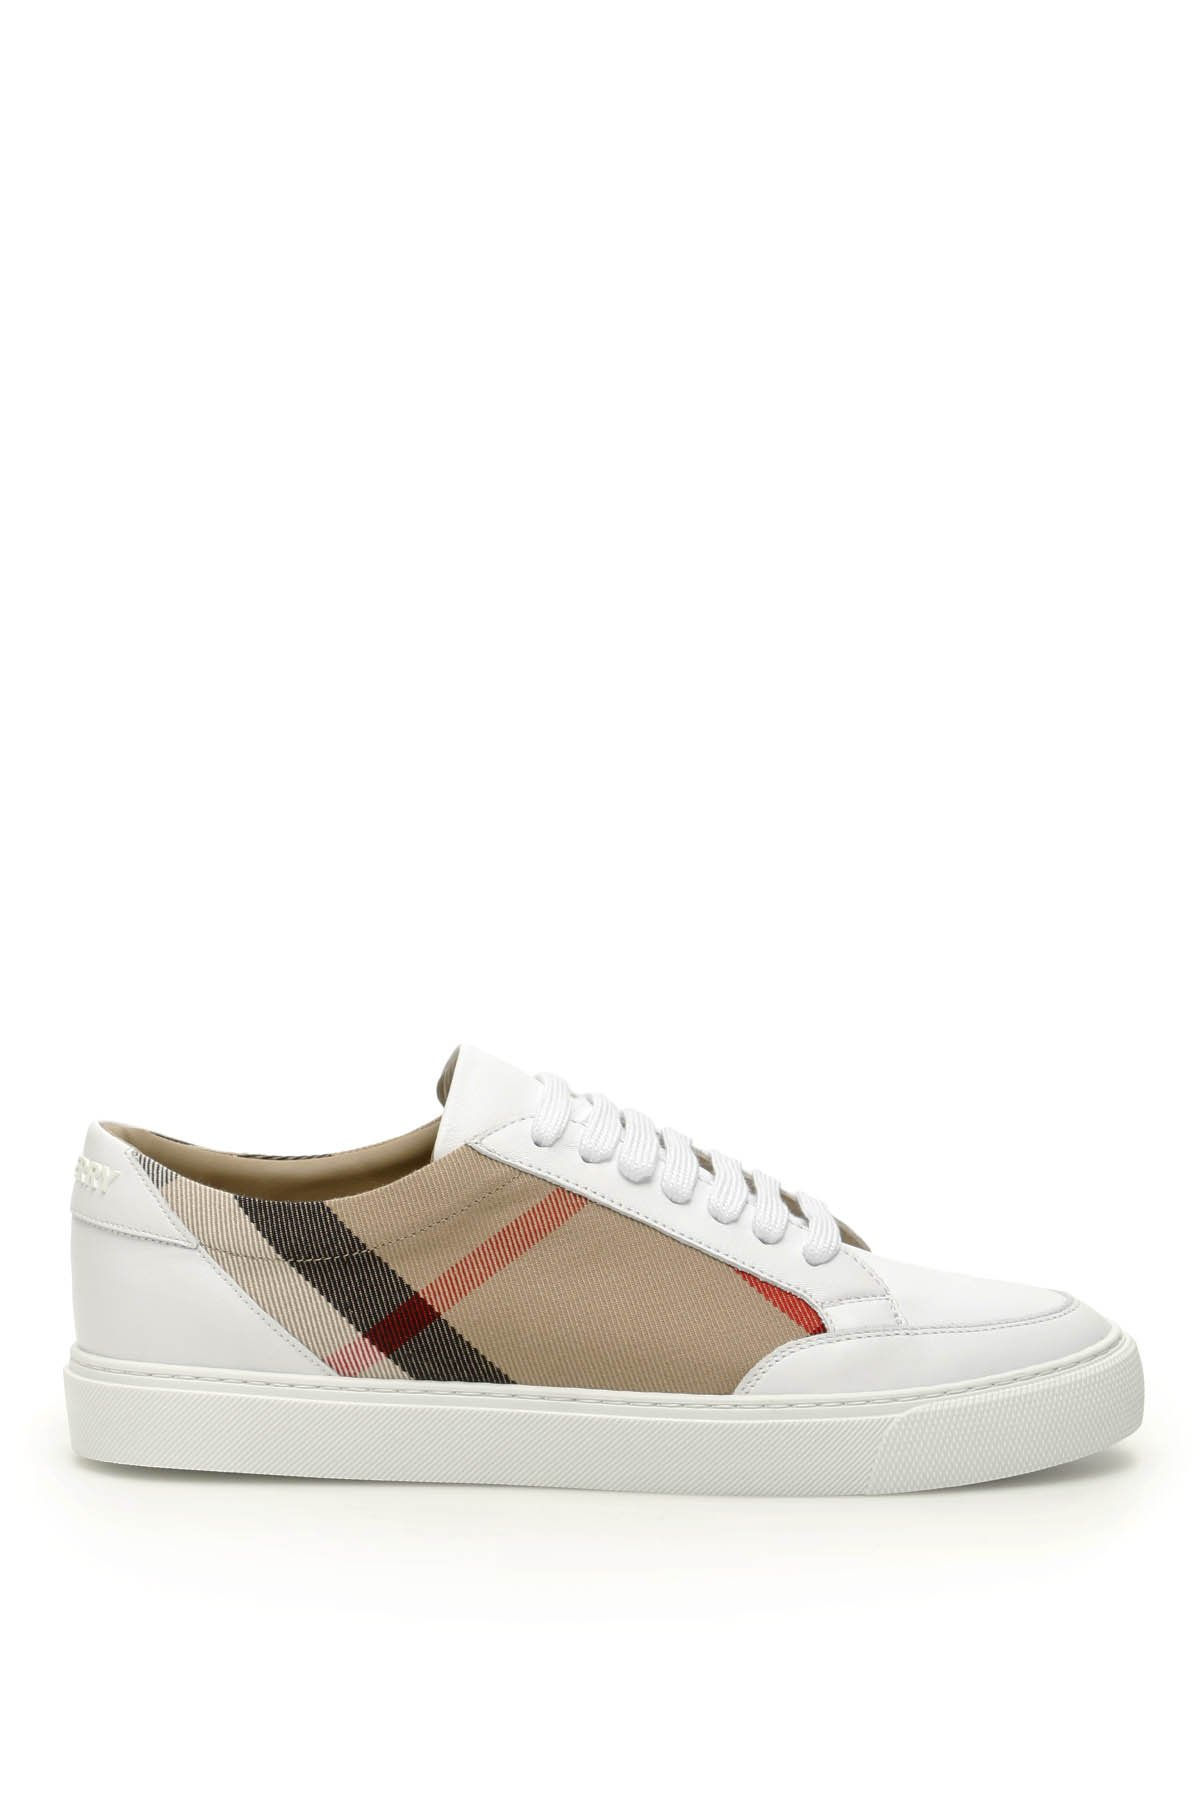 Burberry sneakers new salmond